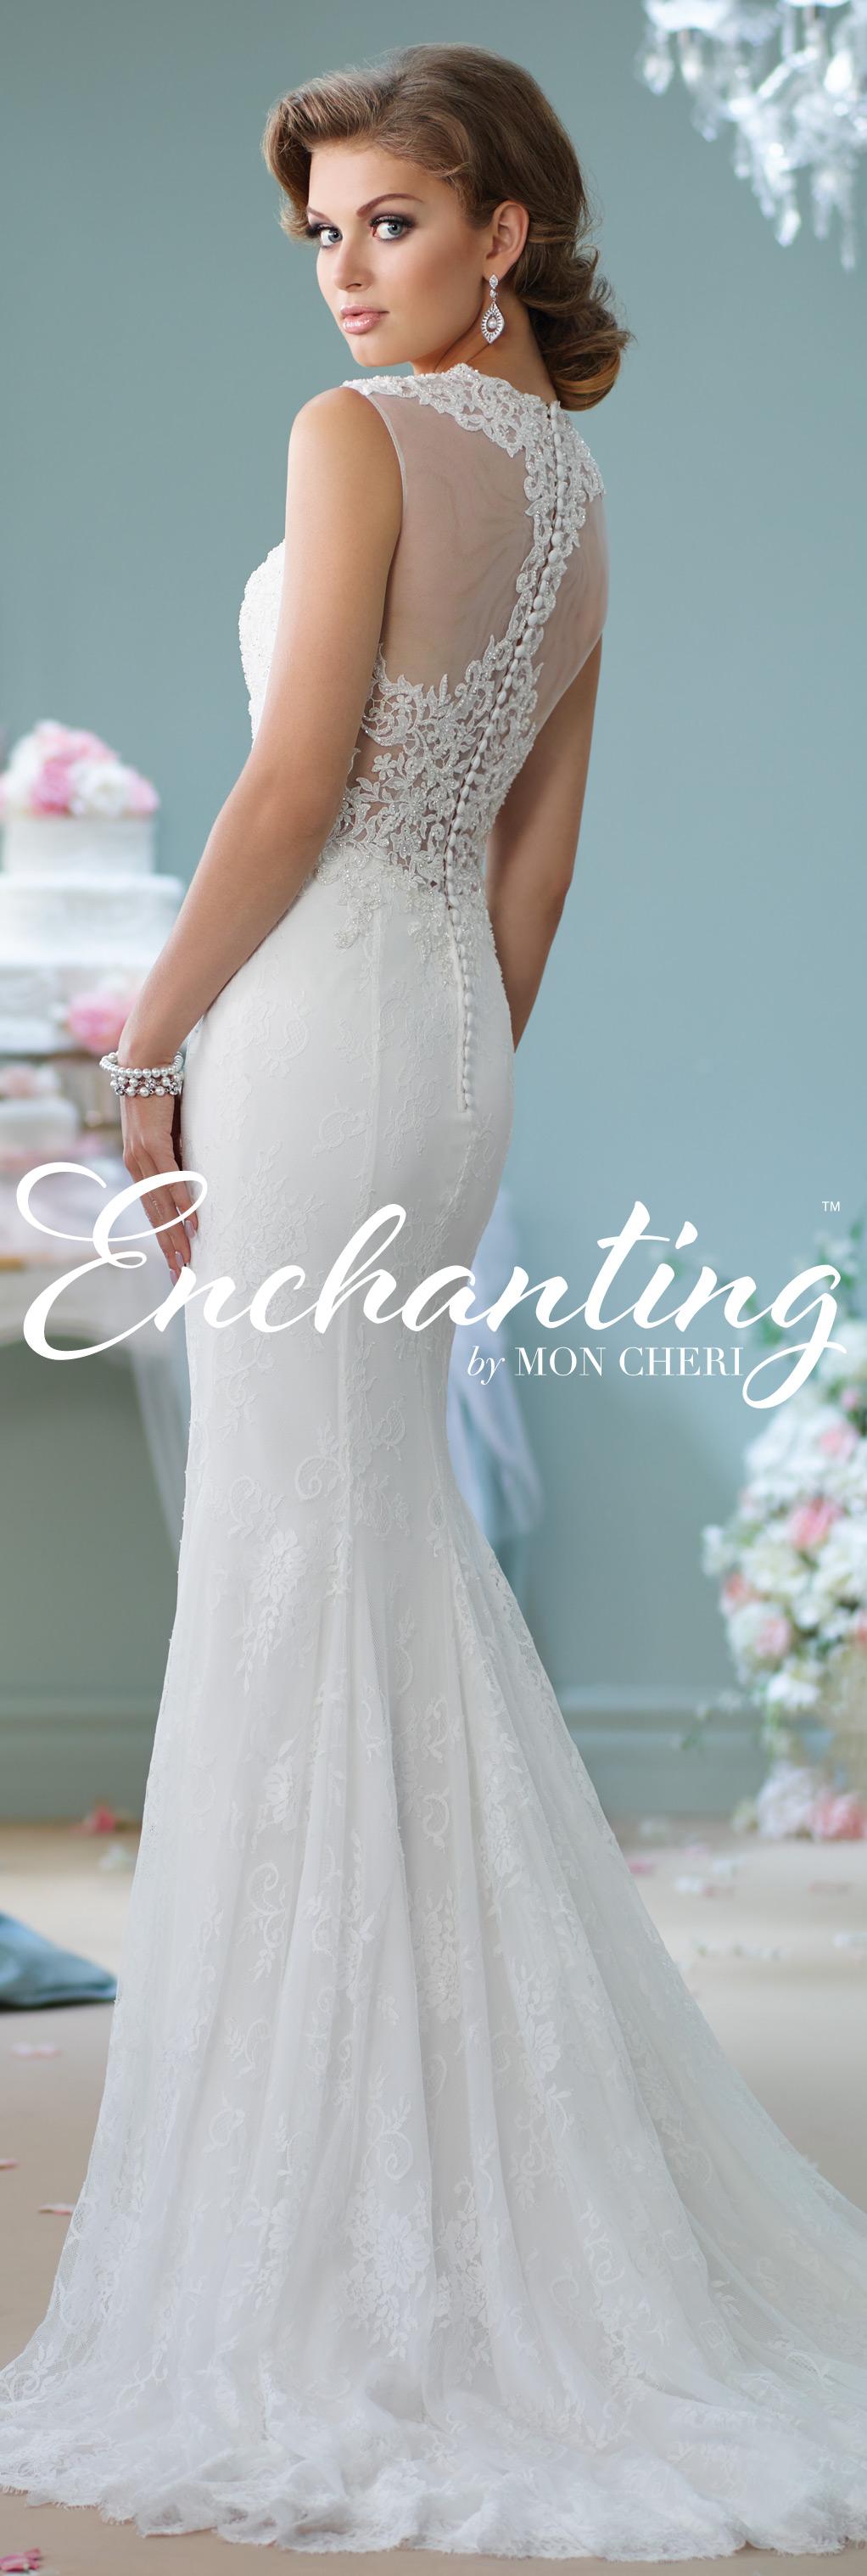 Modern Wedding Dresses 2018 by Mon Cheri   Enchanted, Wedding dress ...